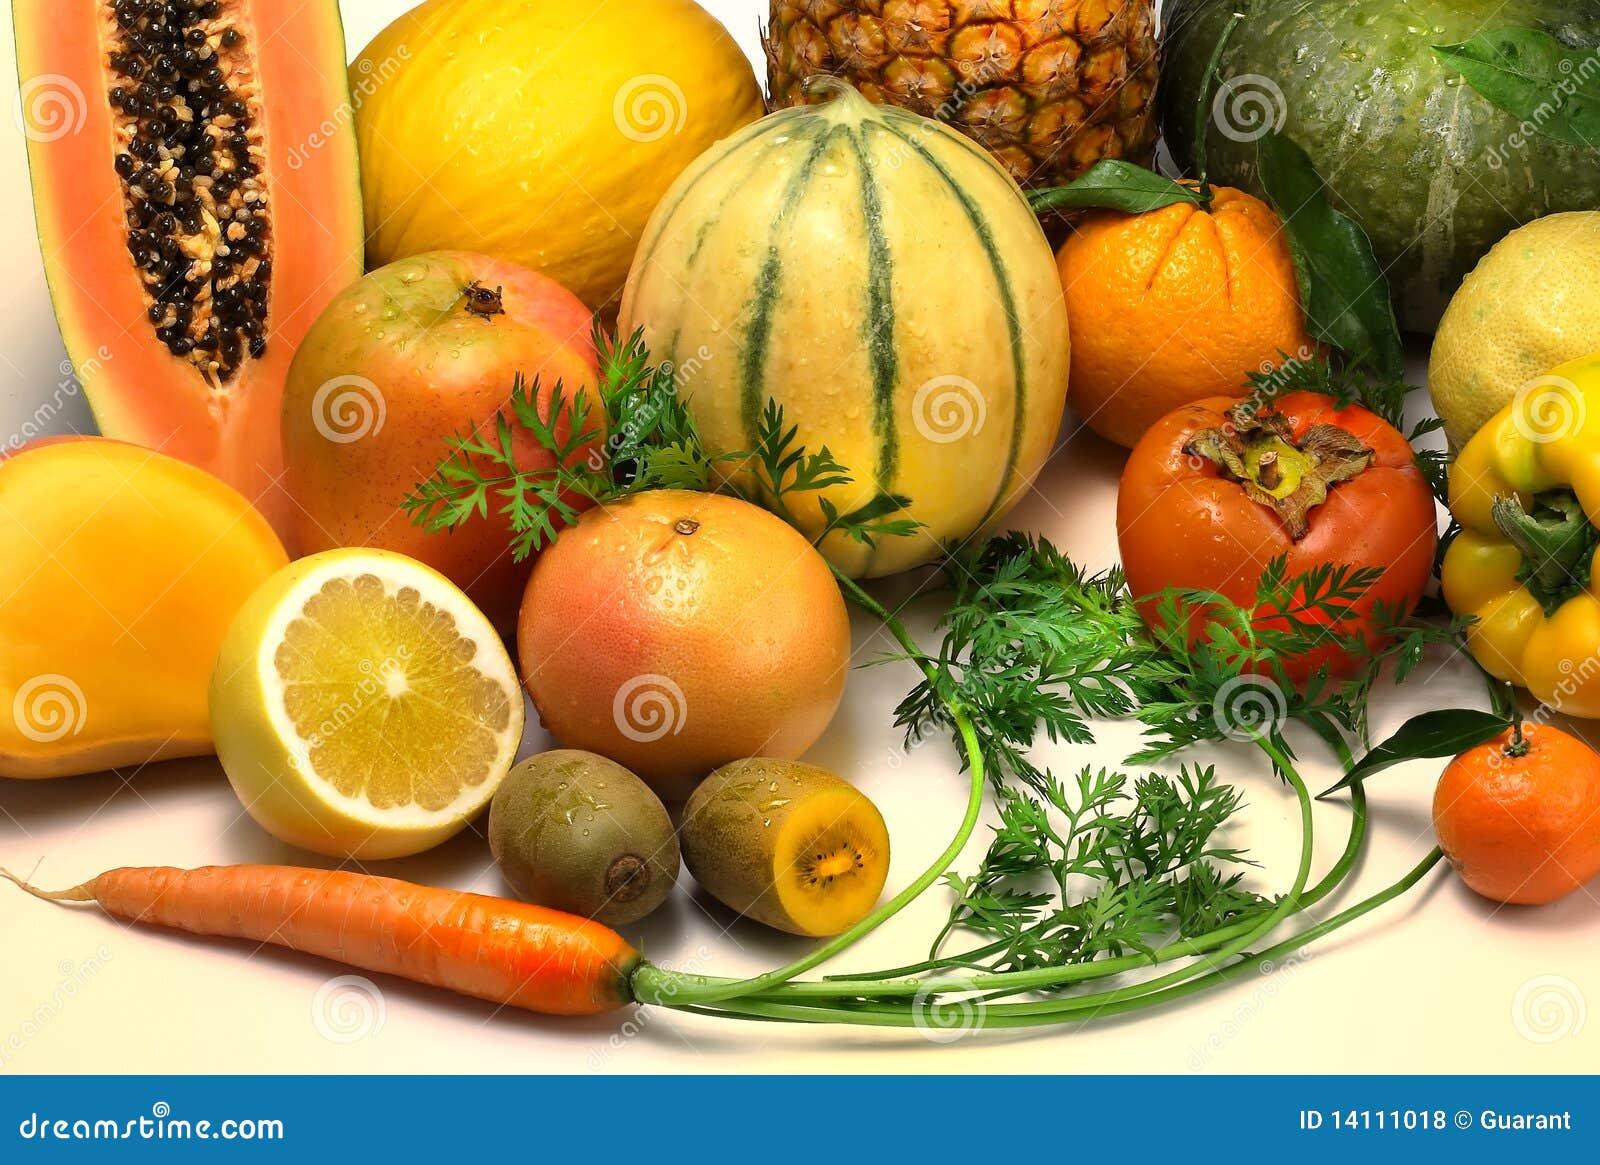 Orange Vegetables And Fruits Fruits And Vegetables ...